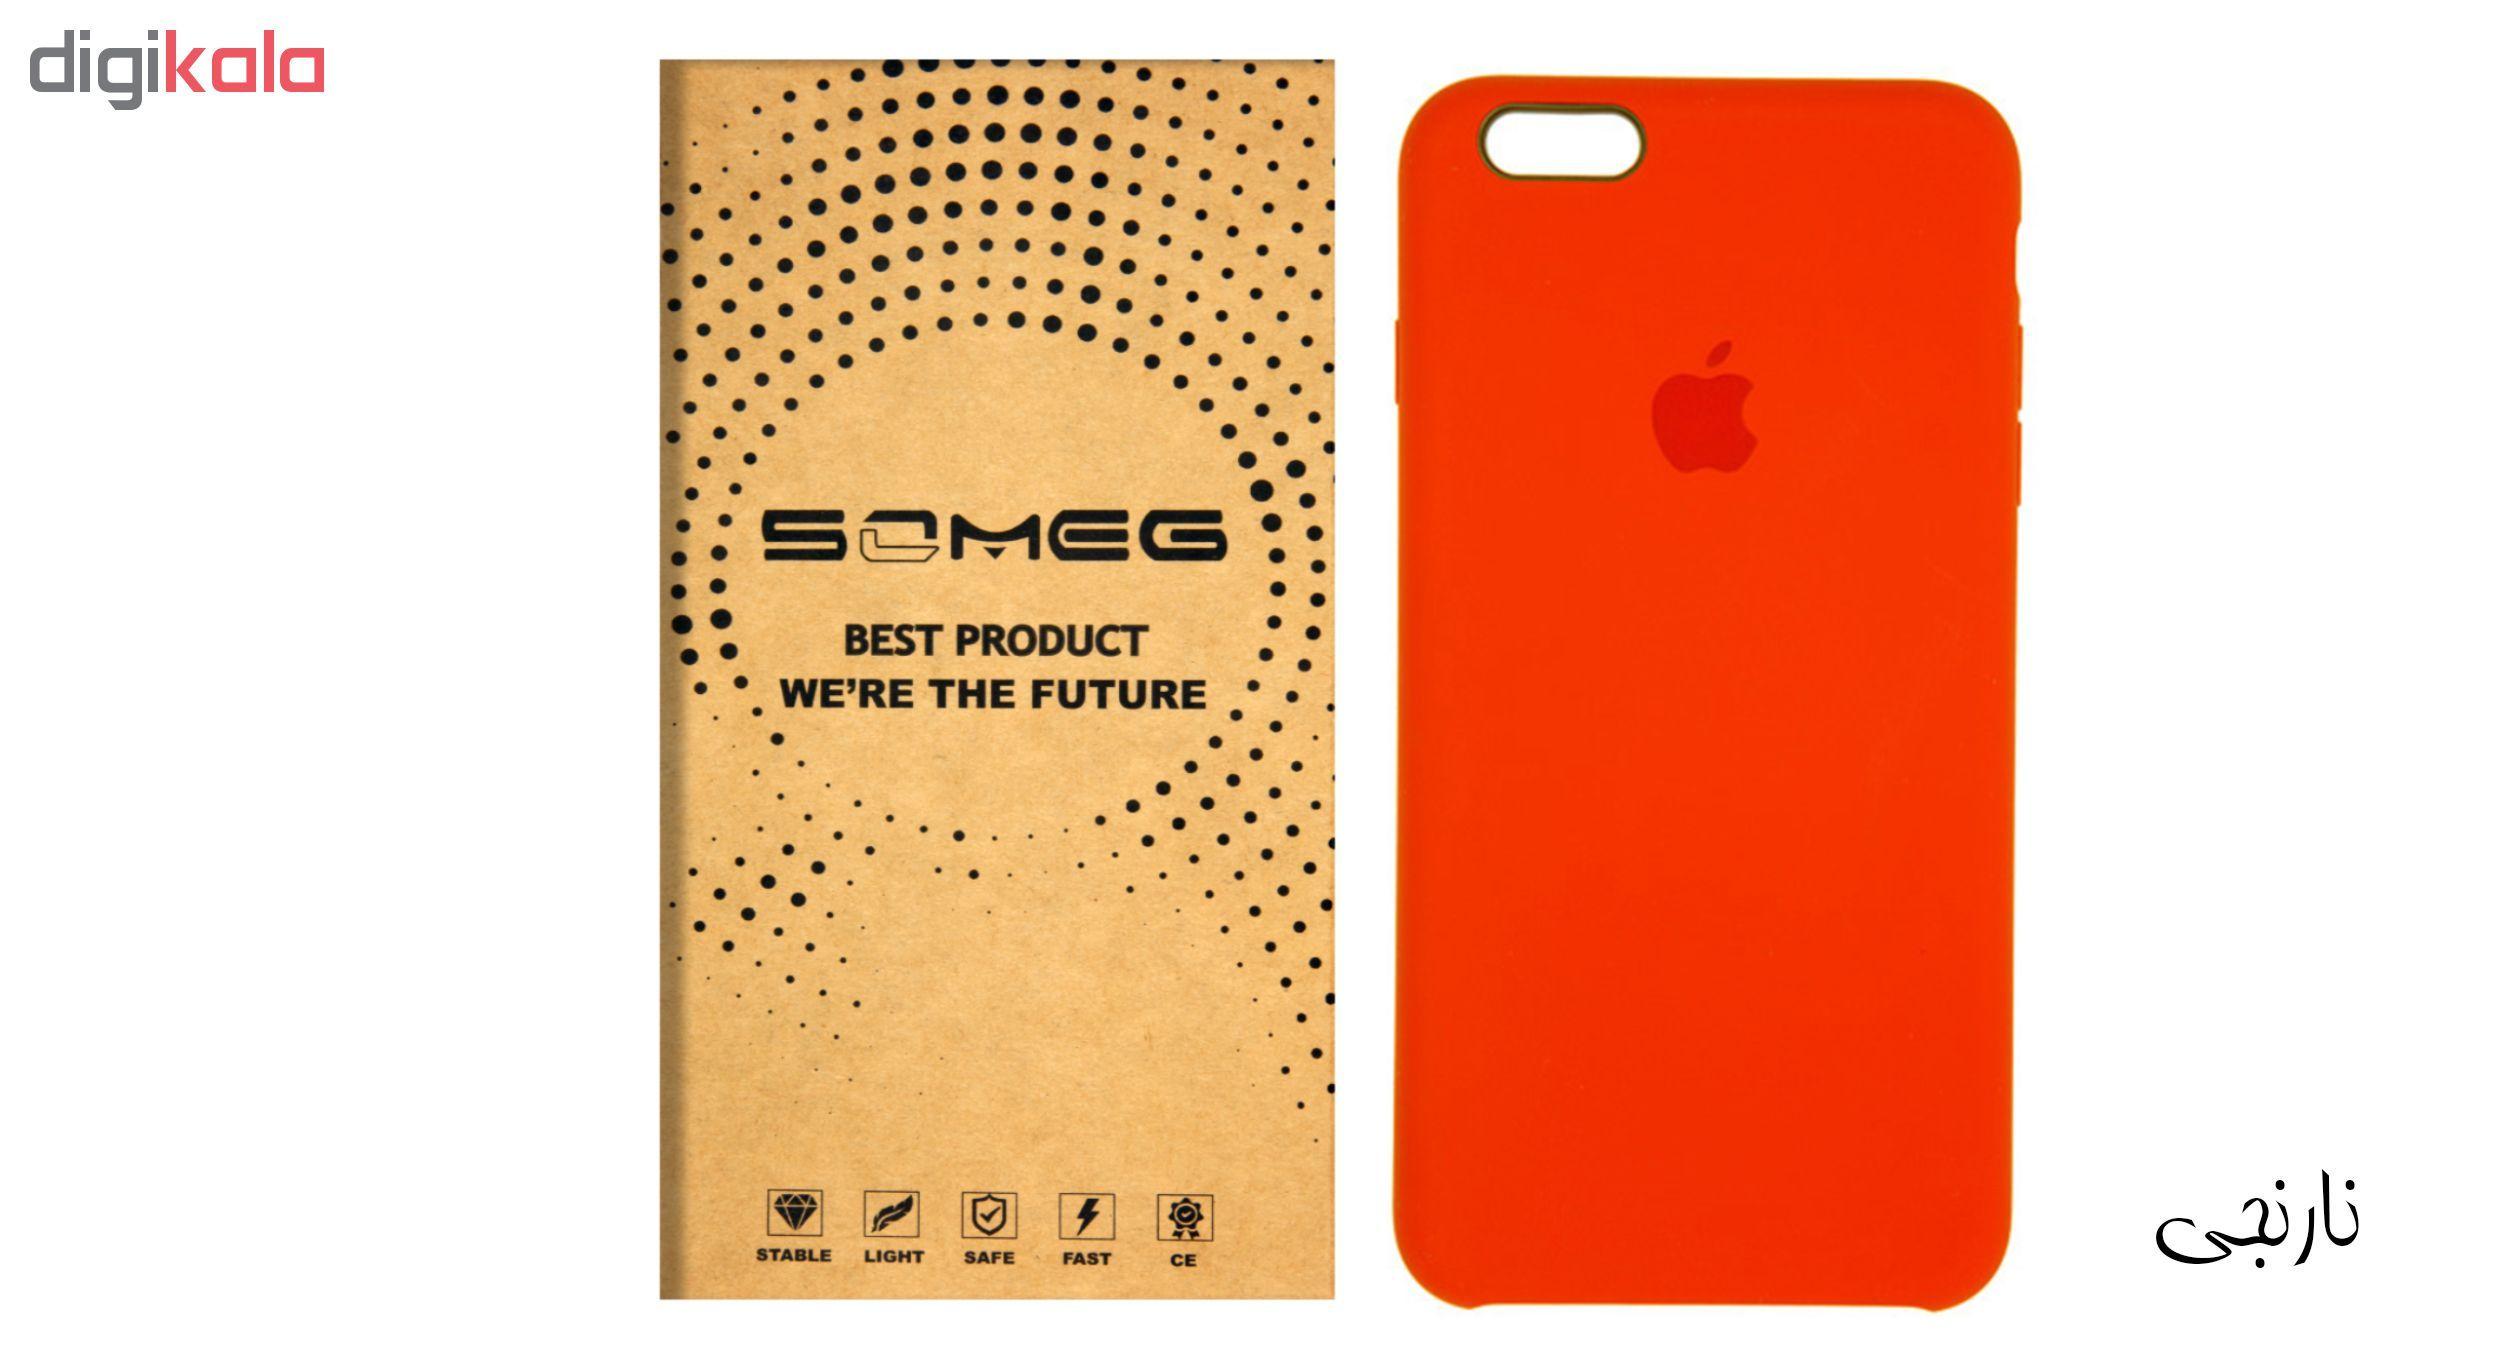 کاور سومگ مدل SIC مناسب برای گوشی موبایل اپل iPhone 6/6s main 1 24